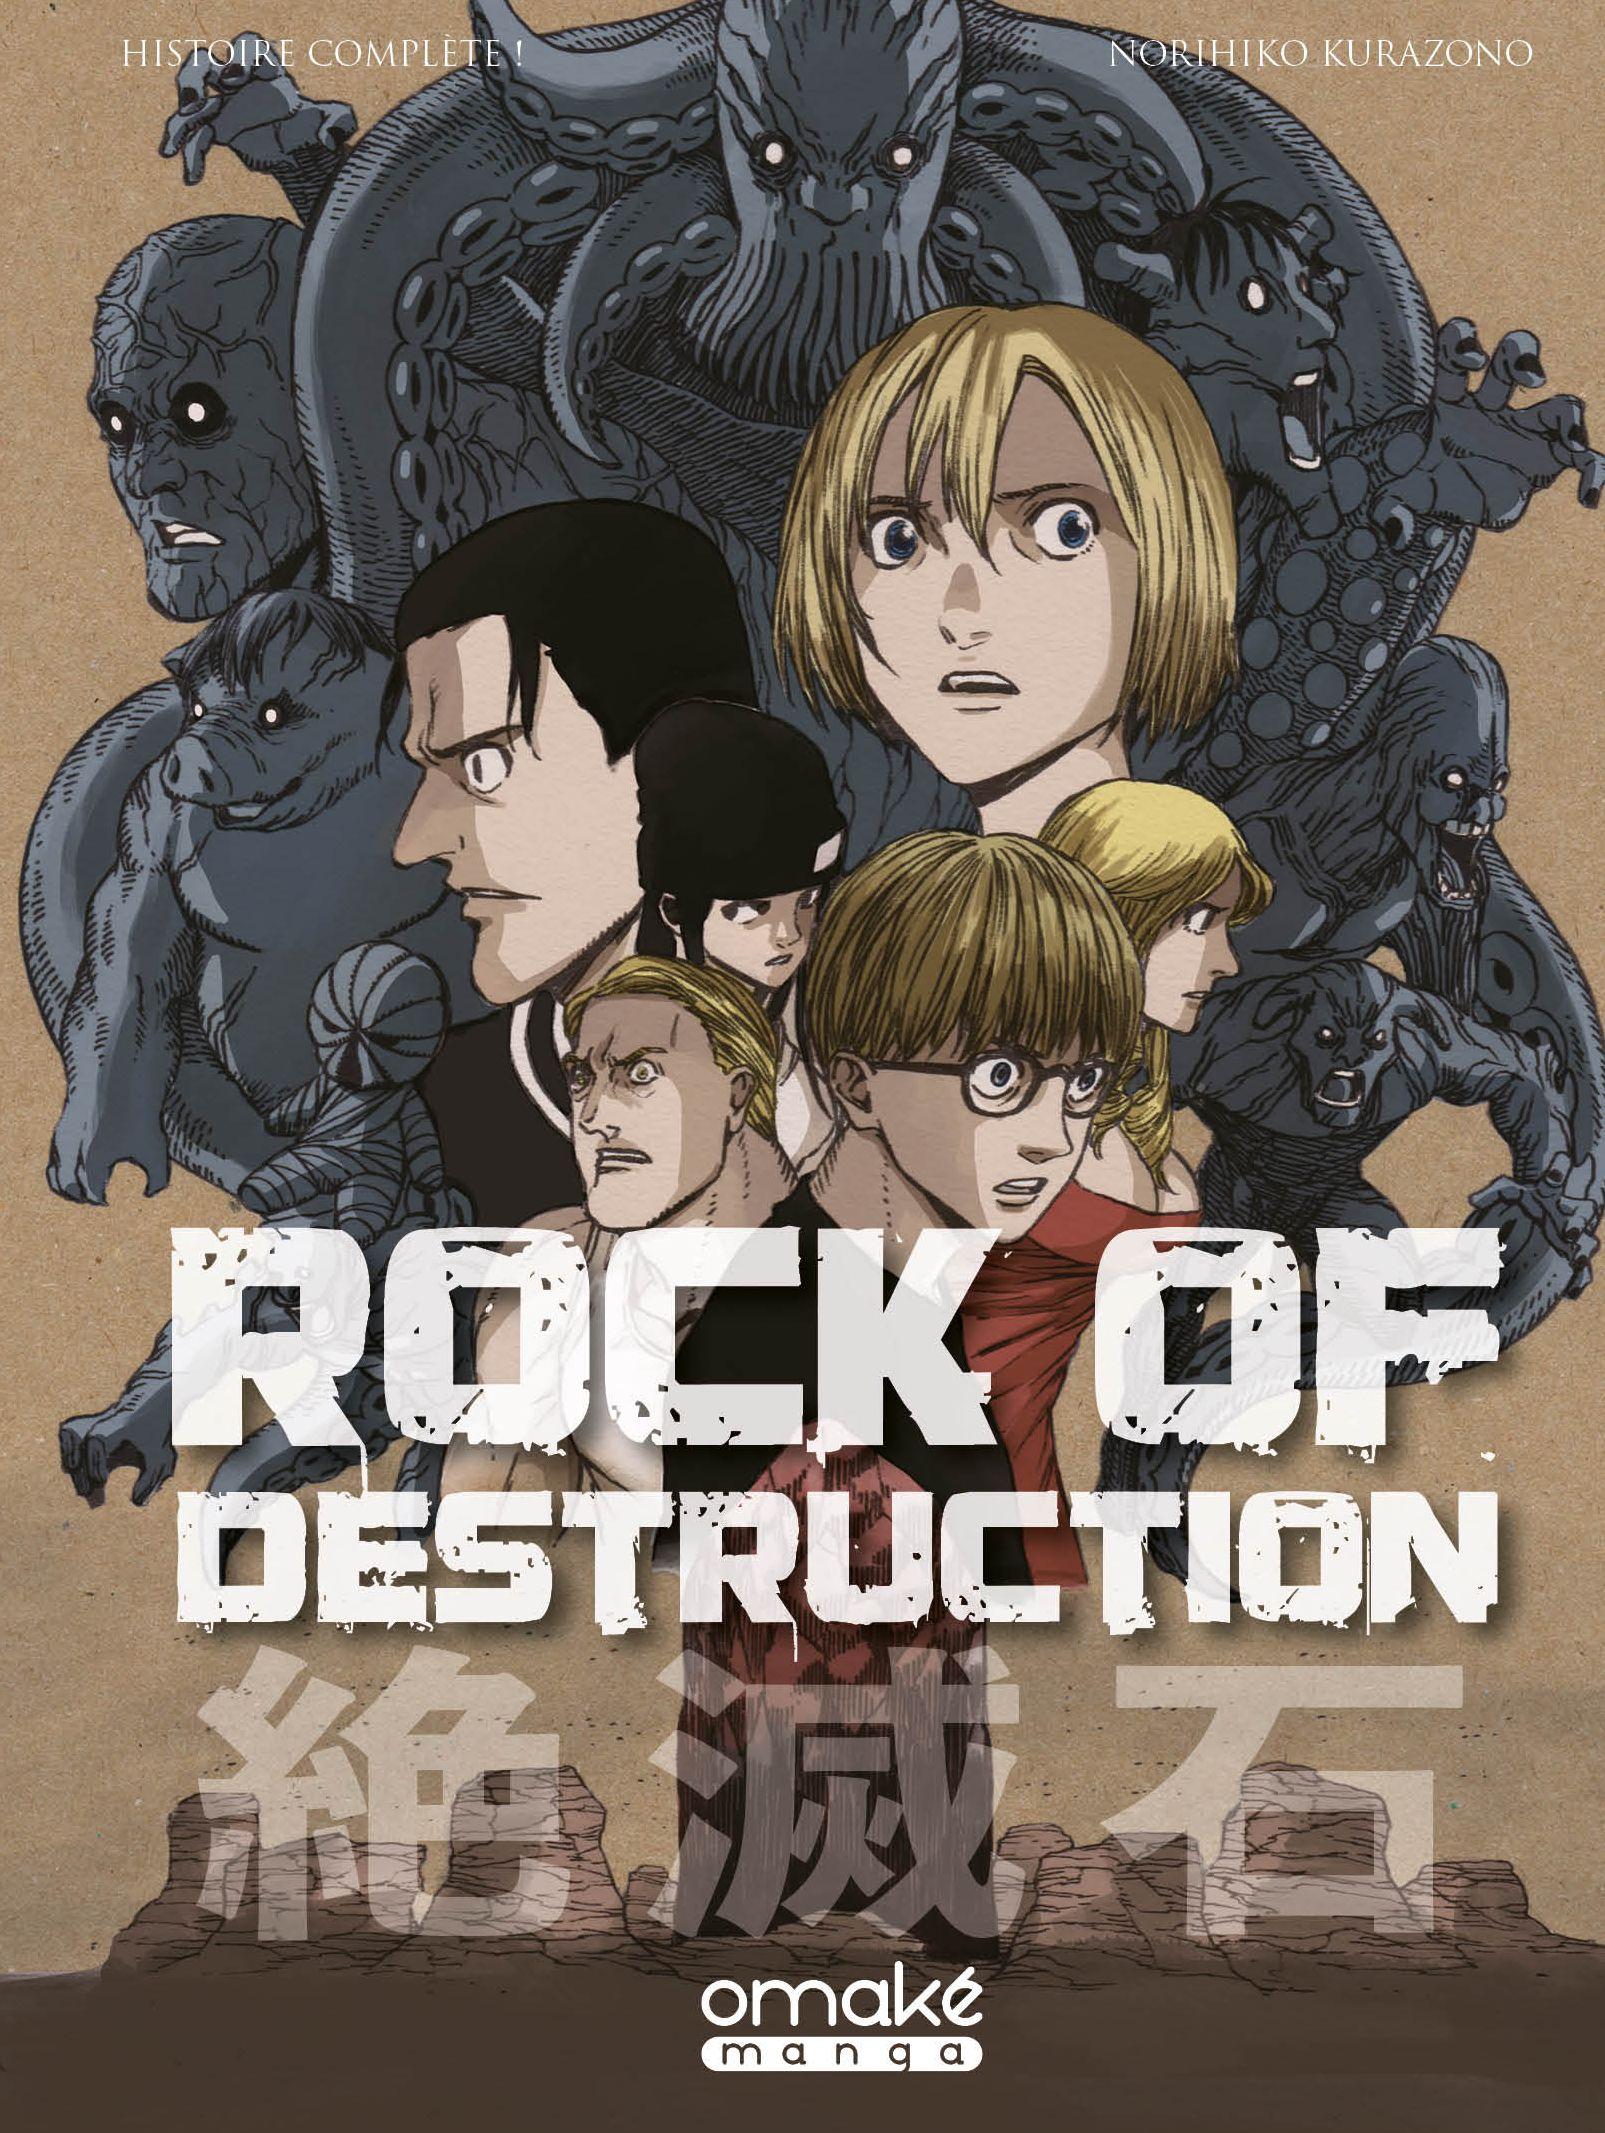 Rock of destruction 1